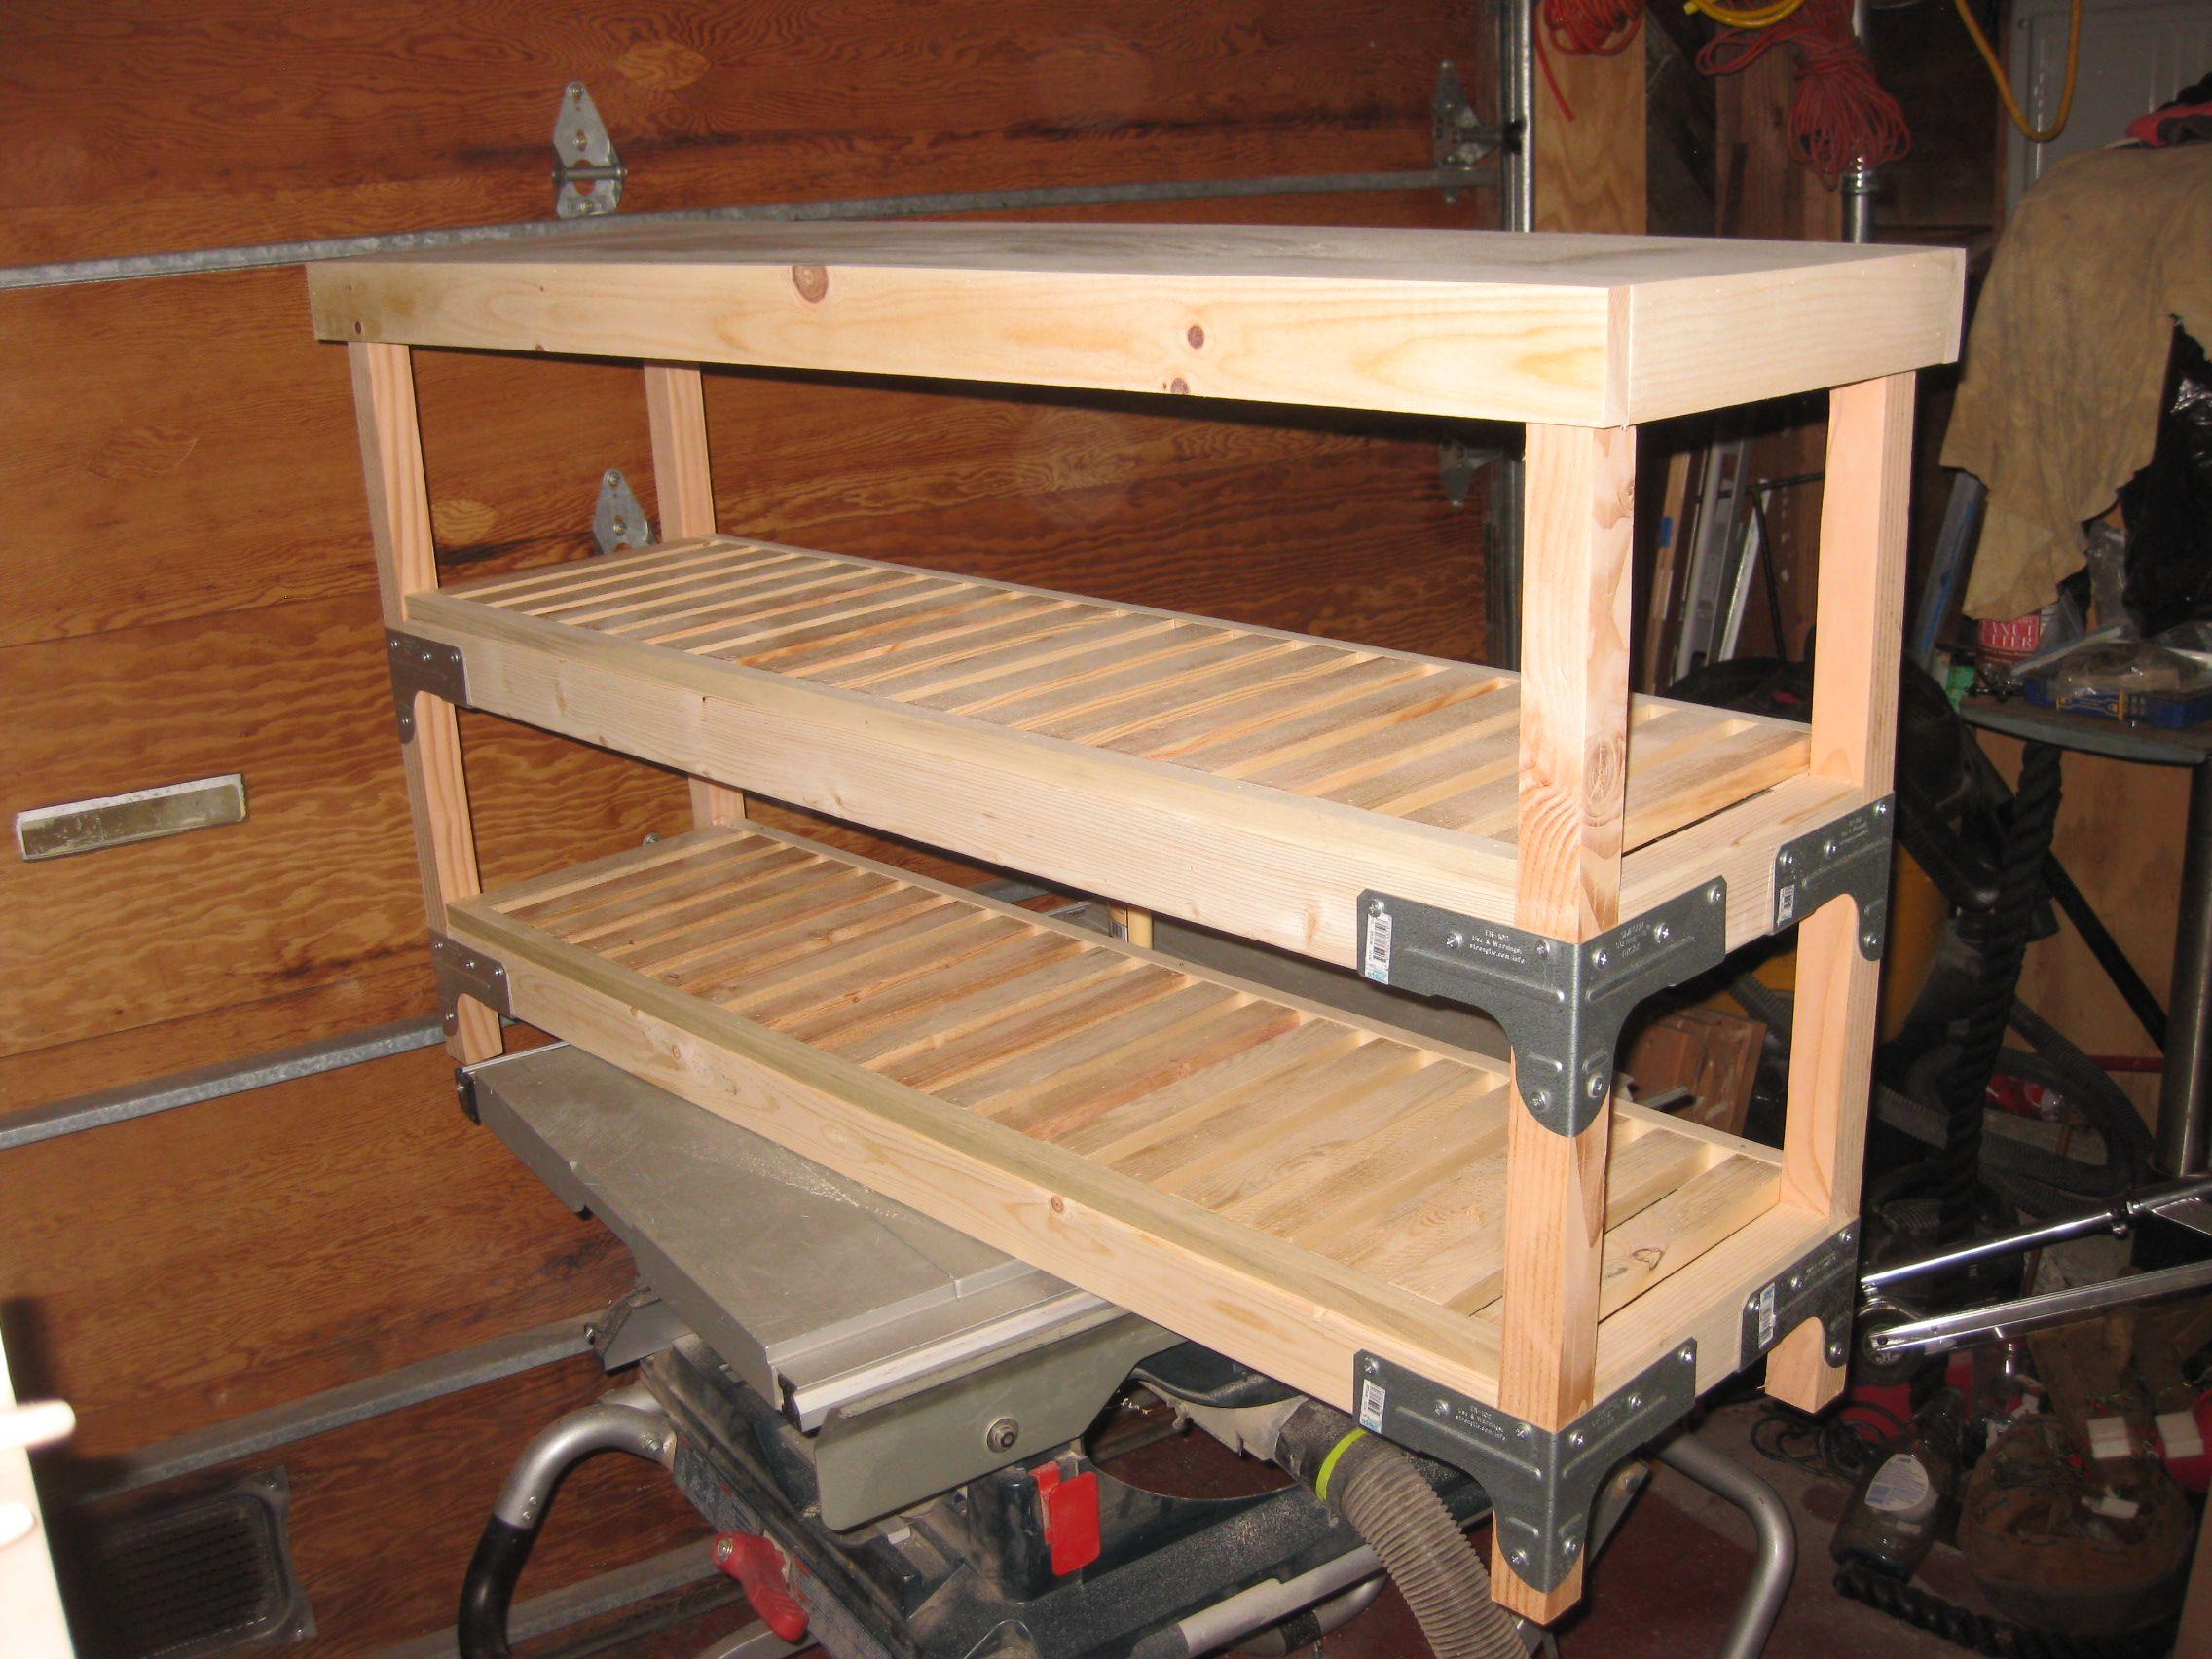 diy shoe rack 5 birdhouse woodworking plans woodworking on wood shoe rack diy simple id=53180